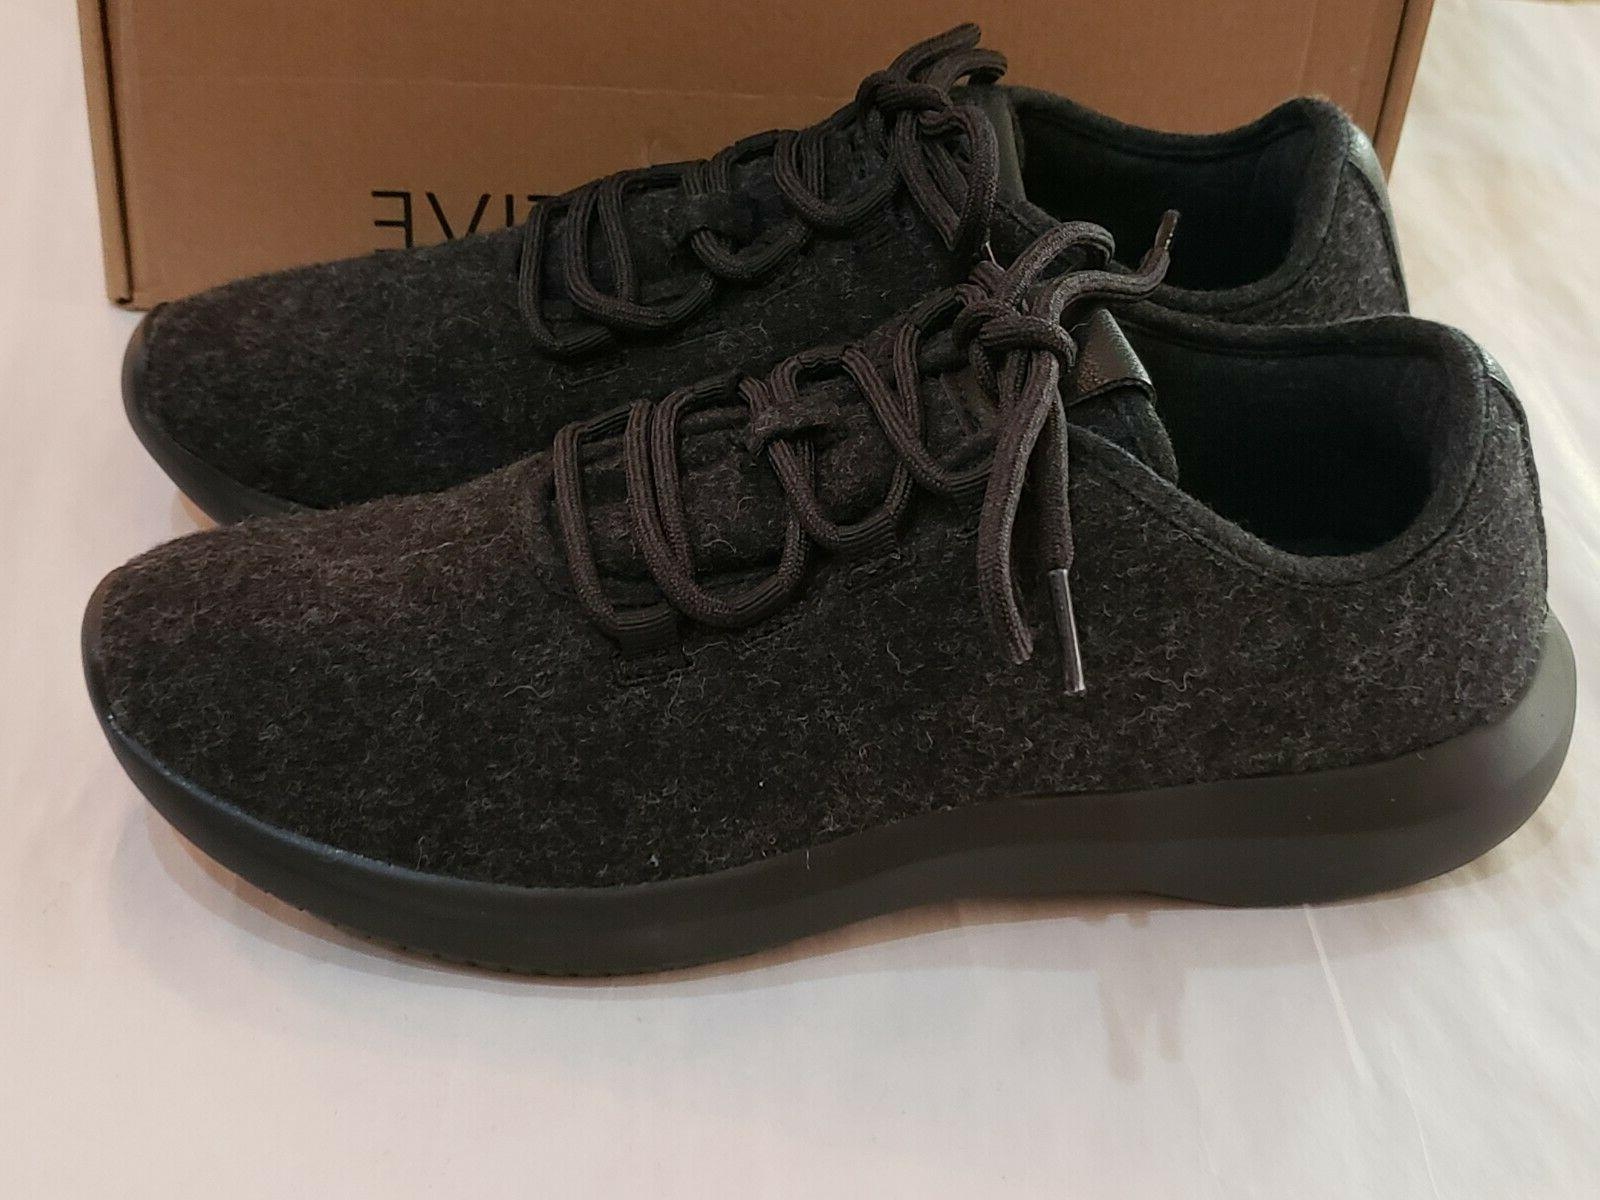 Amazon - Blend Sneakers, 8